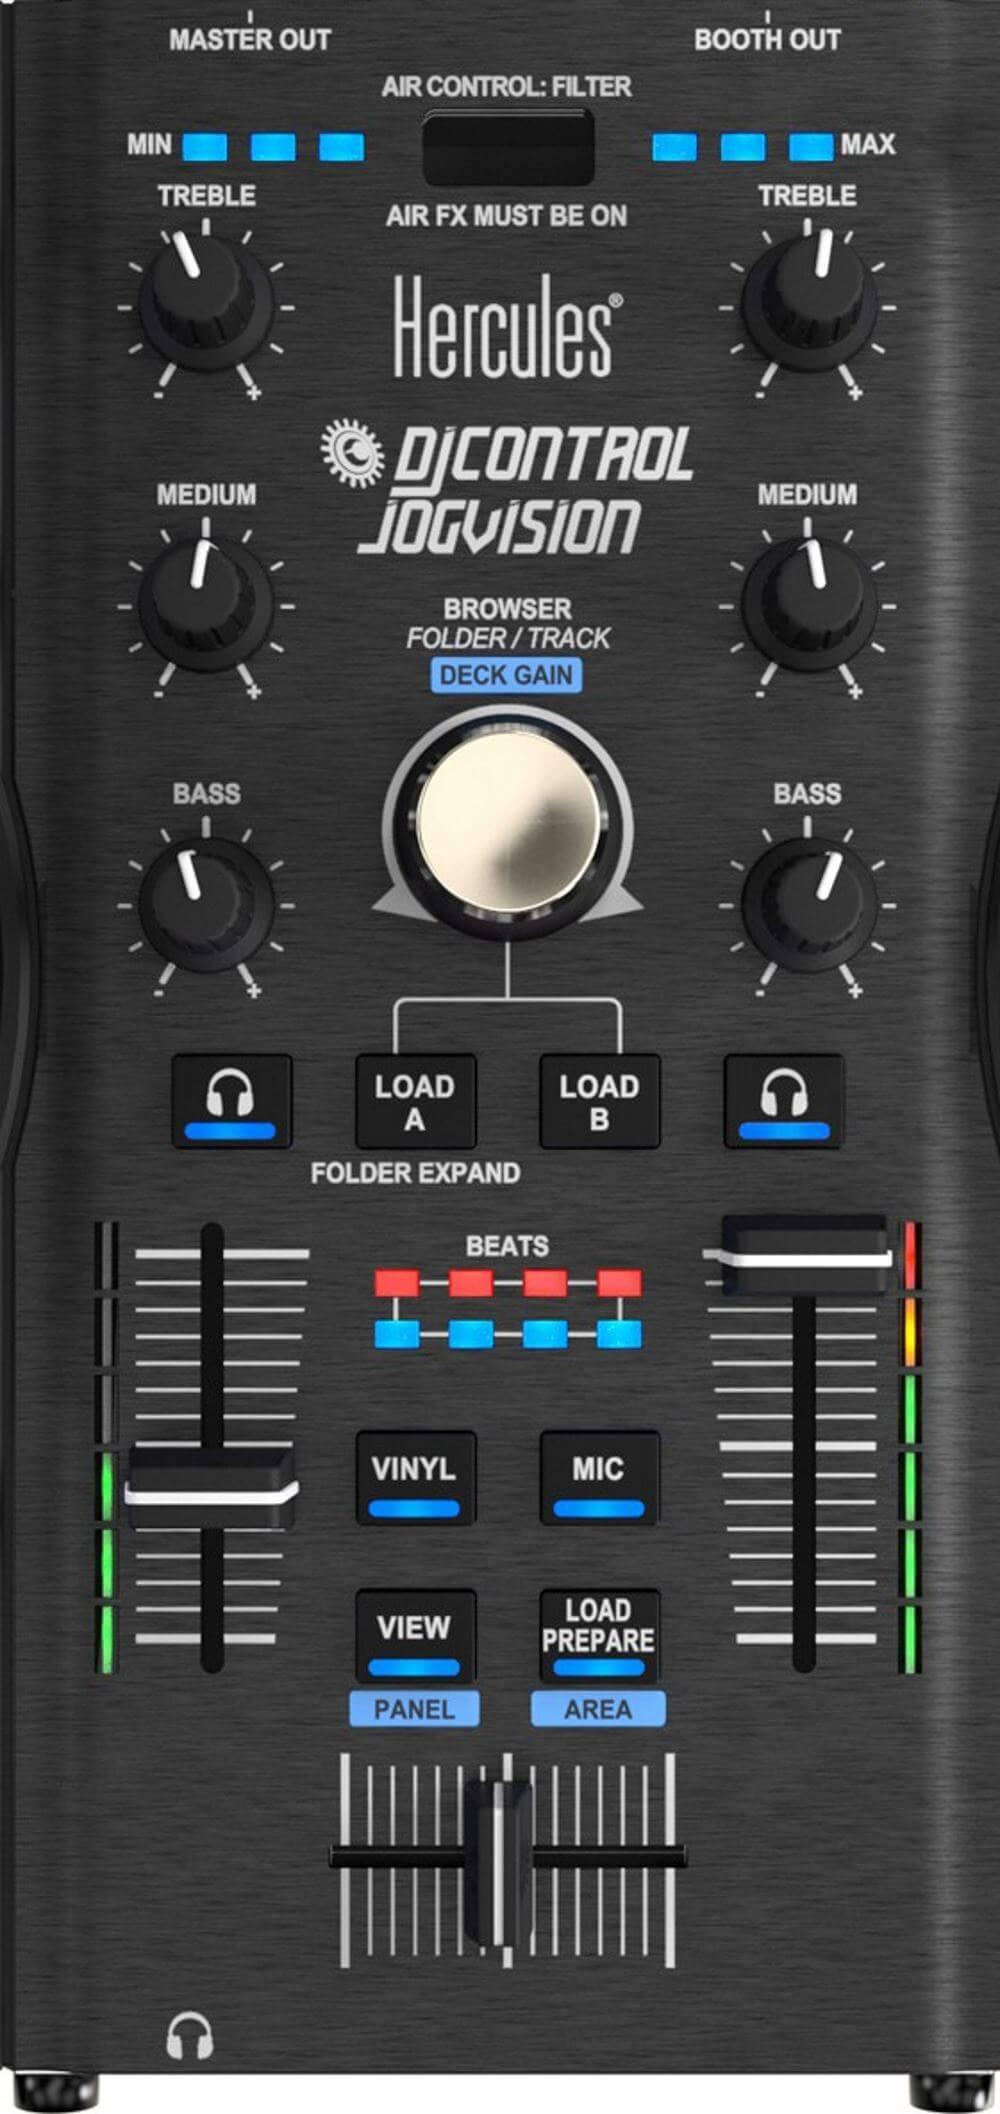 Hercules DJControl Jogvision mixer section